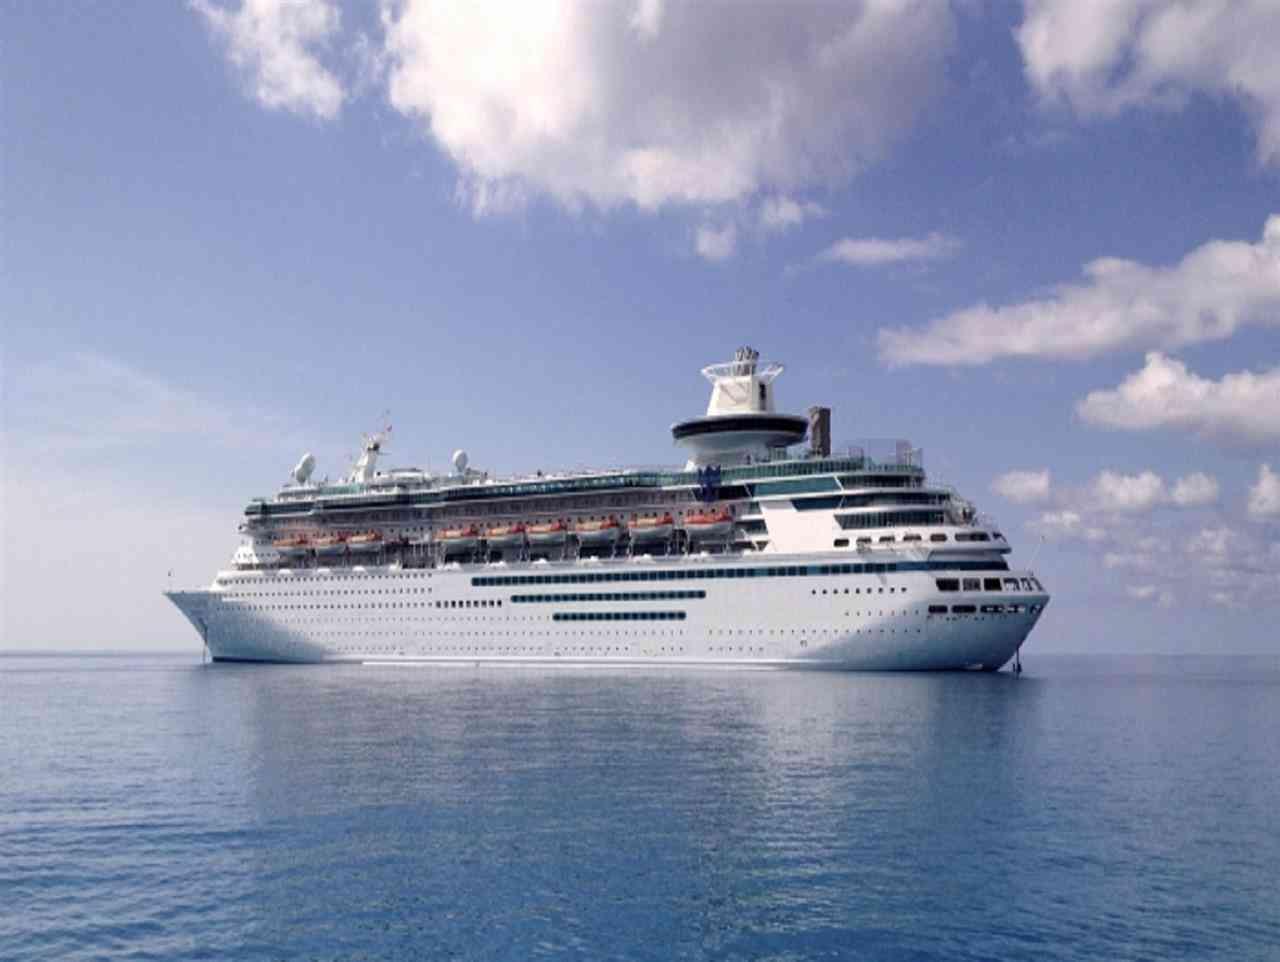 https://resim.gezinomi.com/assets/majesty-of-the-seas-ile-los-angeles-las-vegas-bahamalar-miami-14096--1-21.7.2019150606-b1.jpg